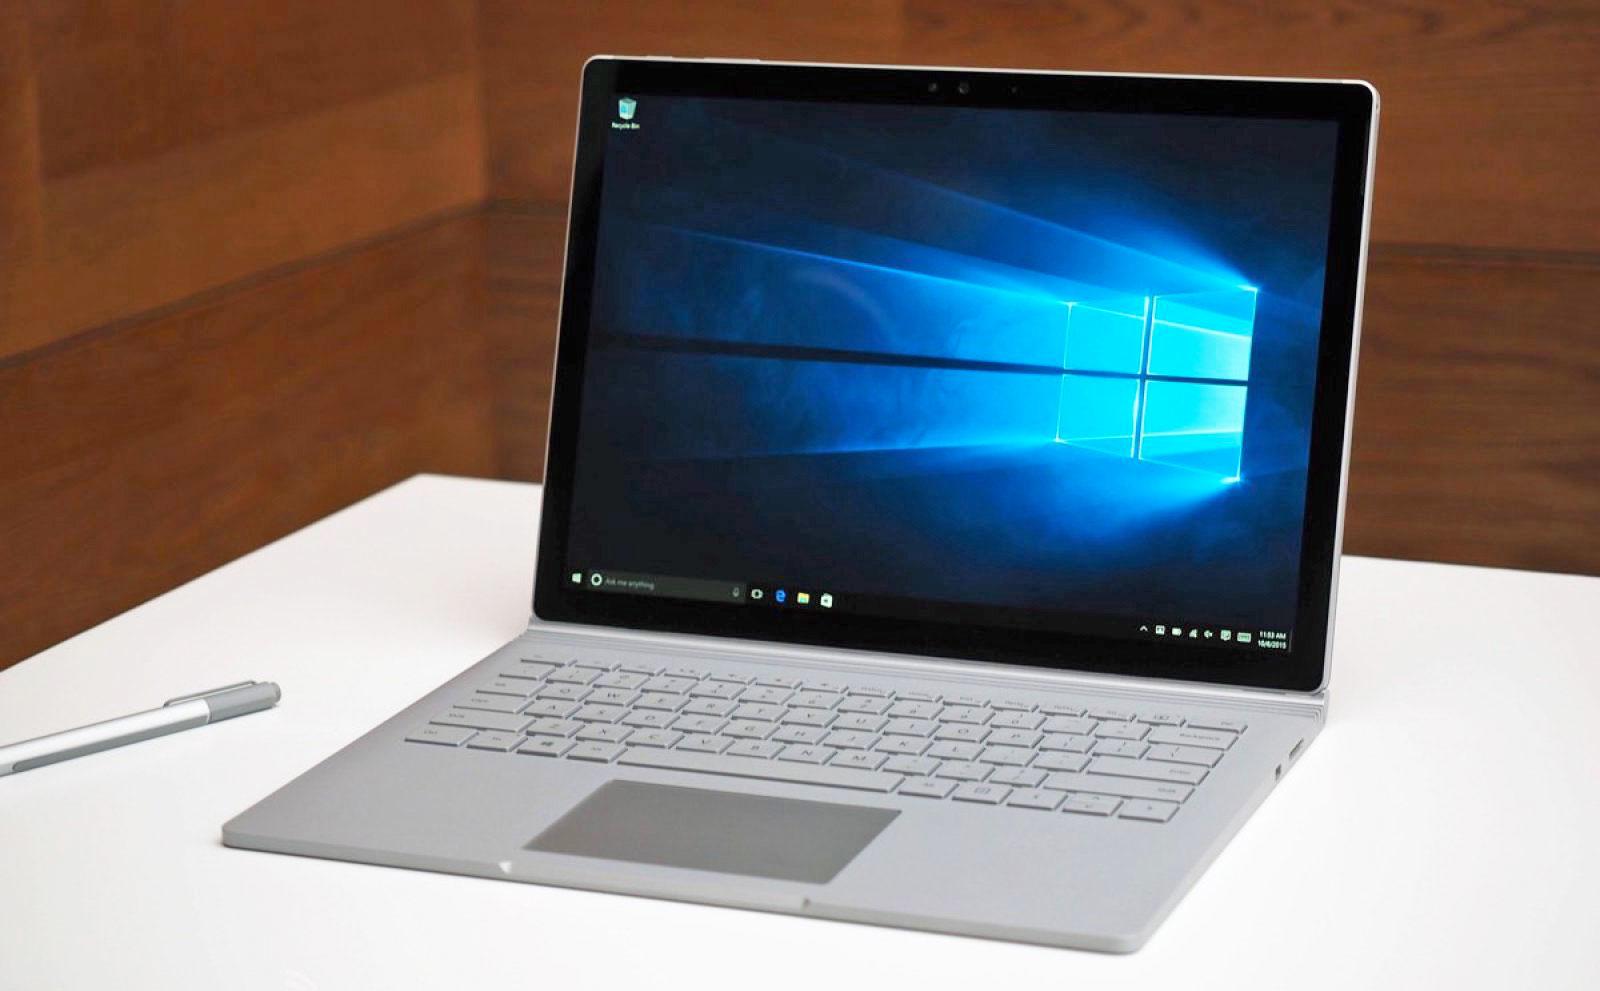 Windows 10 hits 500 million active devices